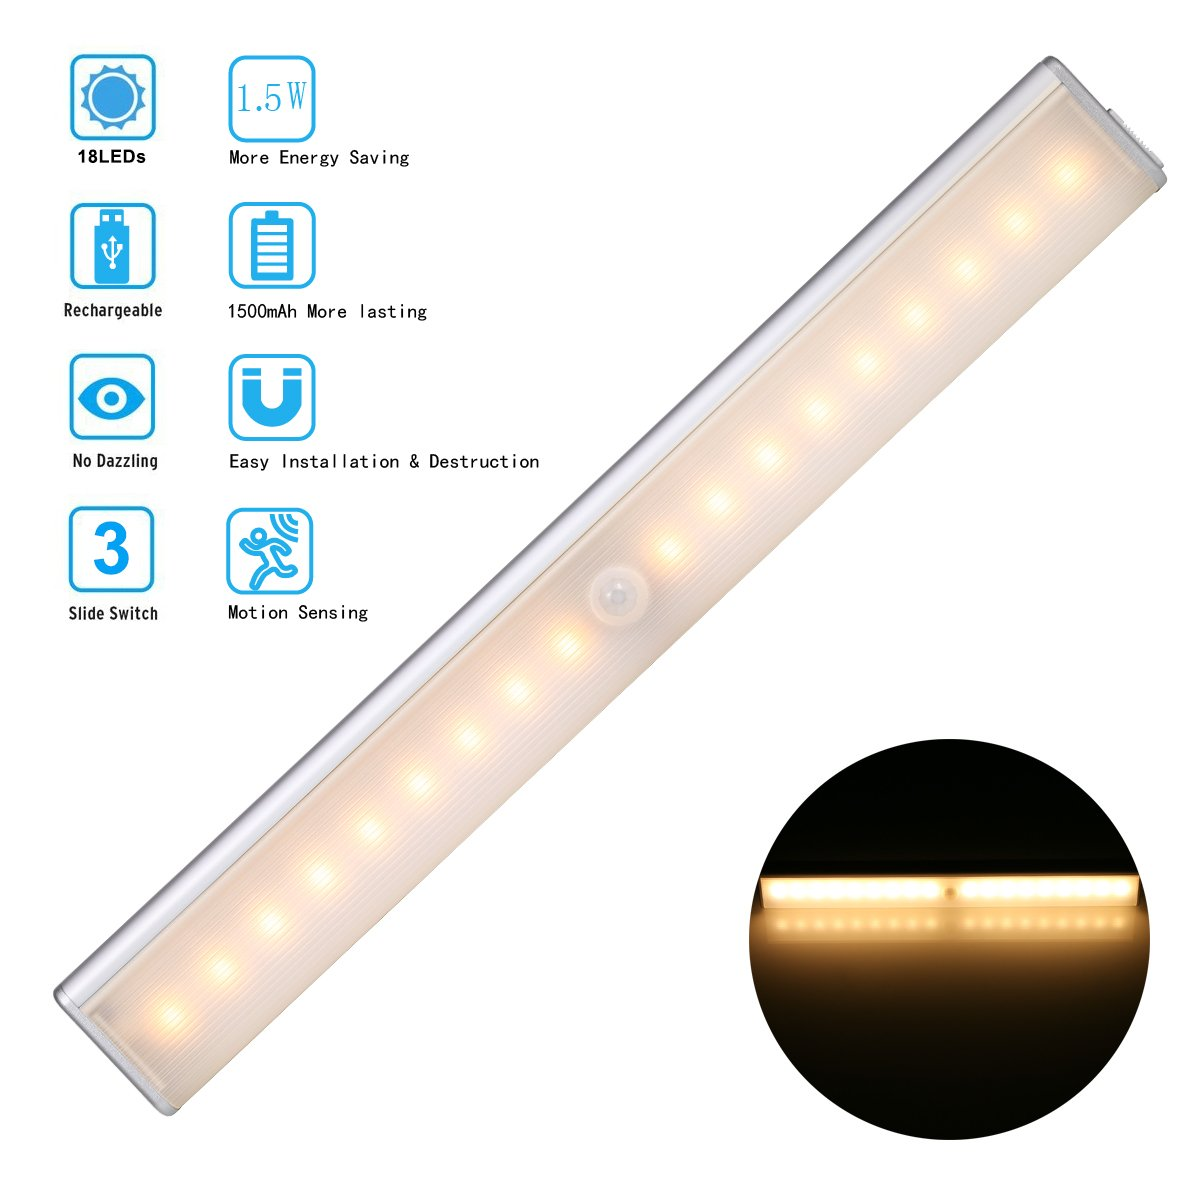 LED Wardrobe Light, 18-LED Rechargeable Motion Sensor Closet Light Warm White LED Night Light/Cupboard Light/Cabinet Light Bar Emergency lights with 1500 mAh Battery ❤1.5 watts More energy-efficient❤